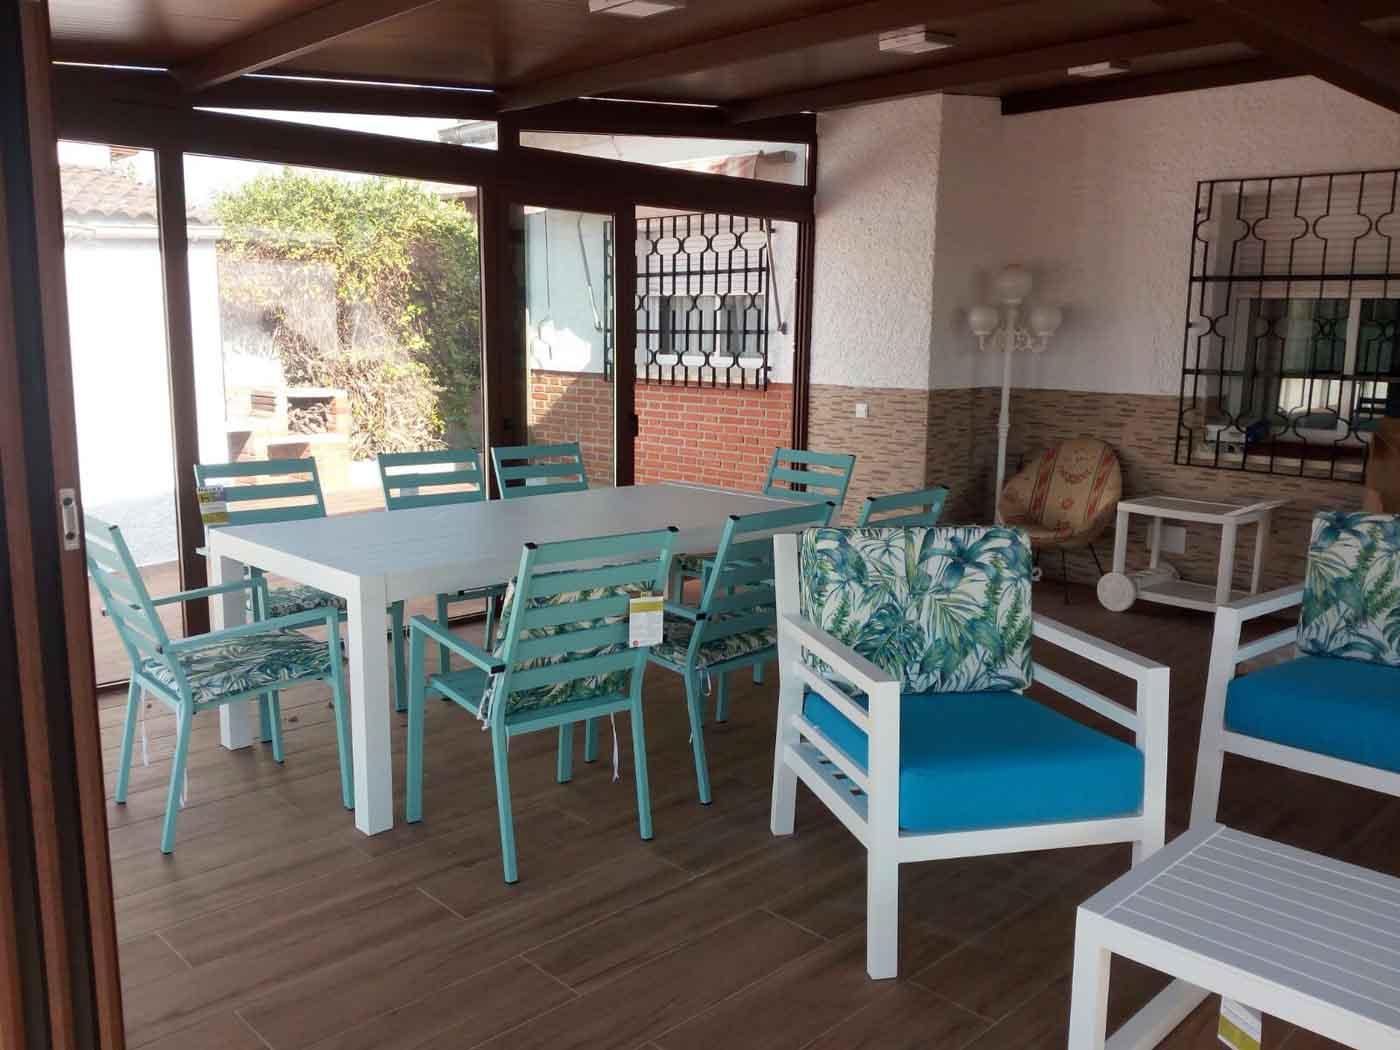 sillas mobiliario jardin